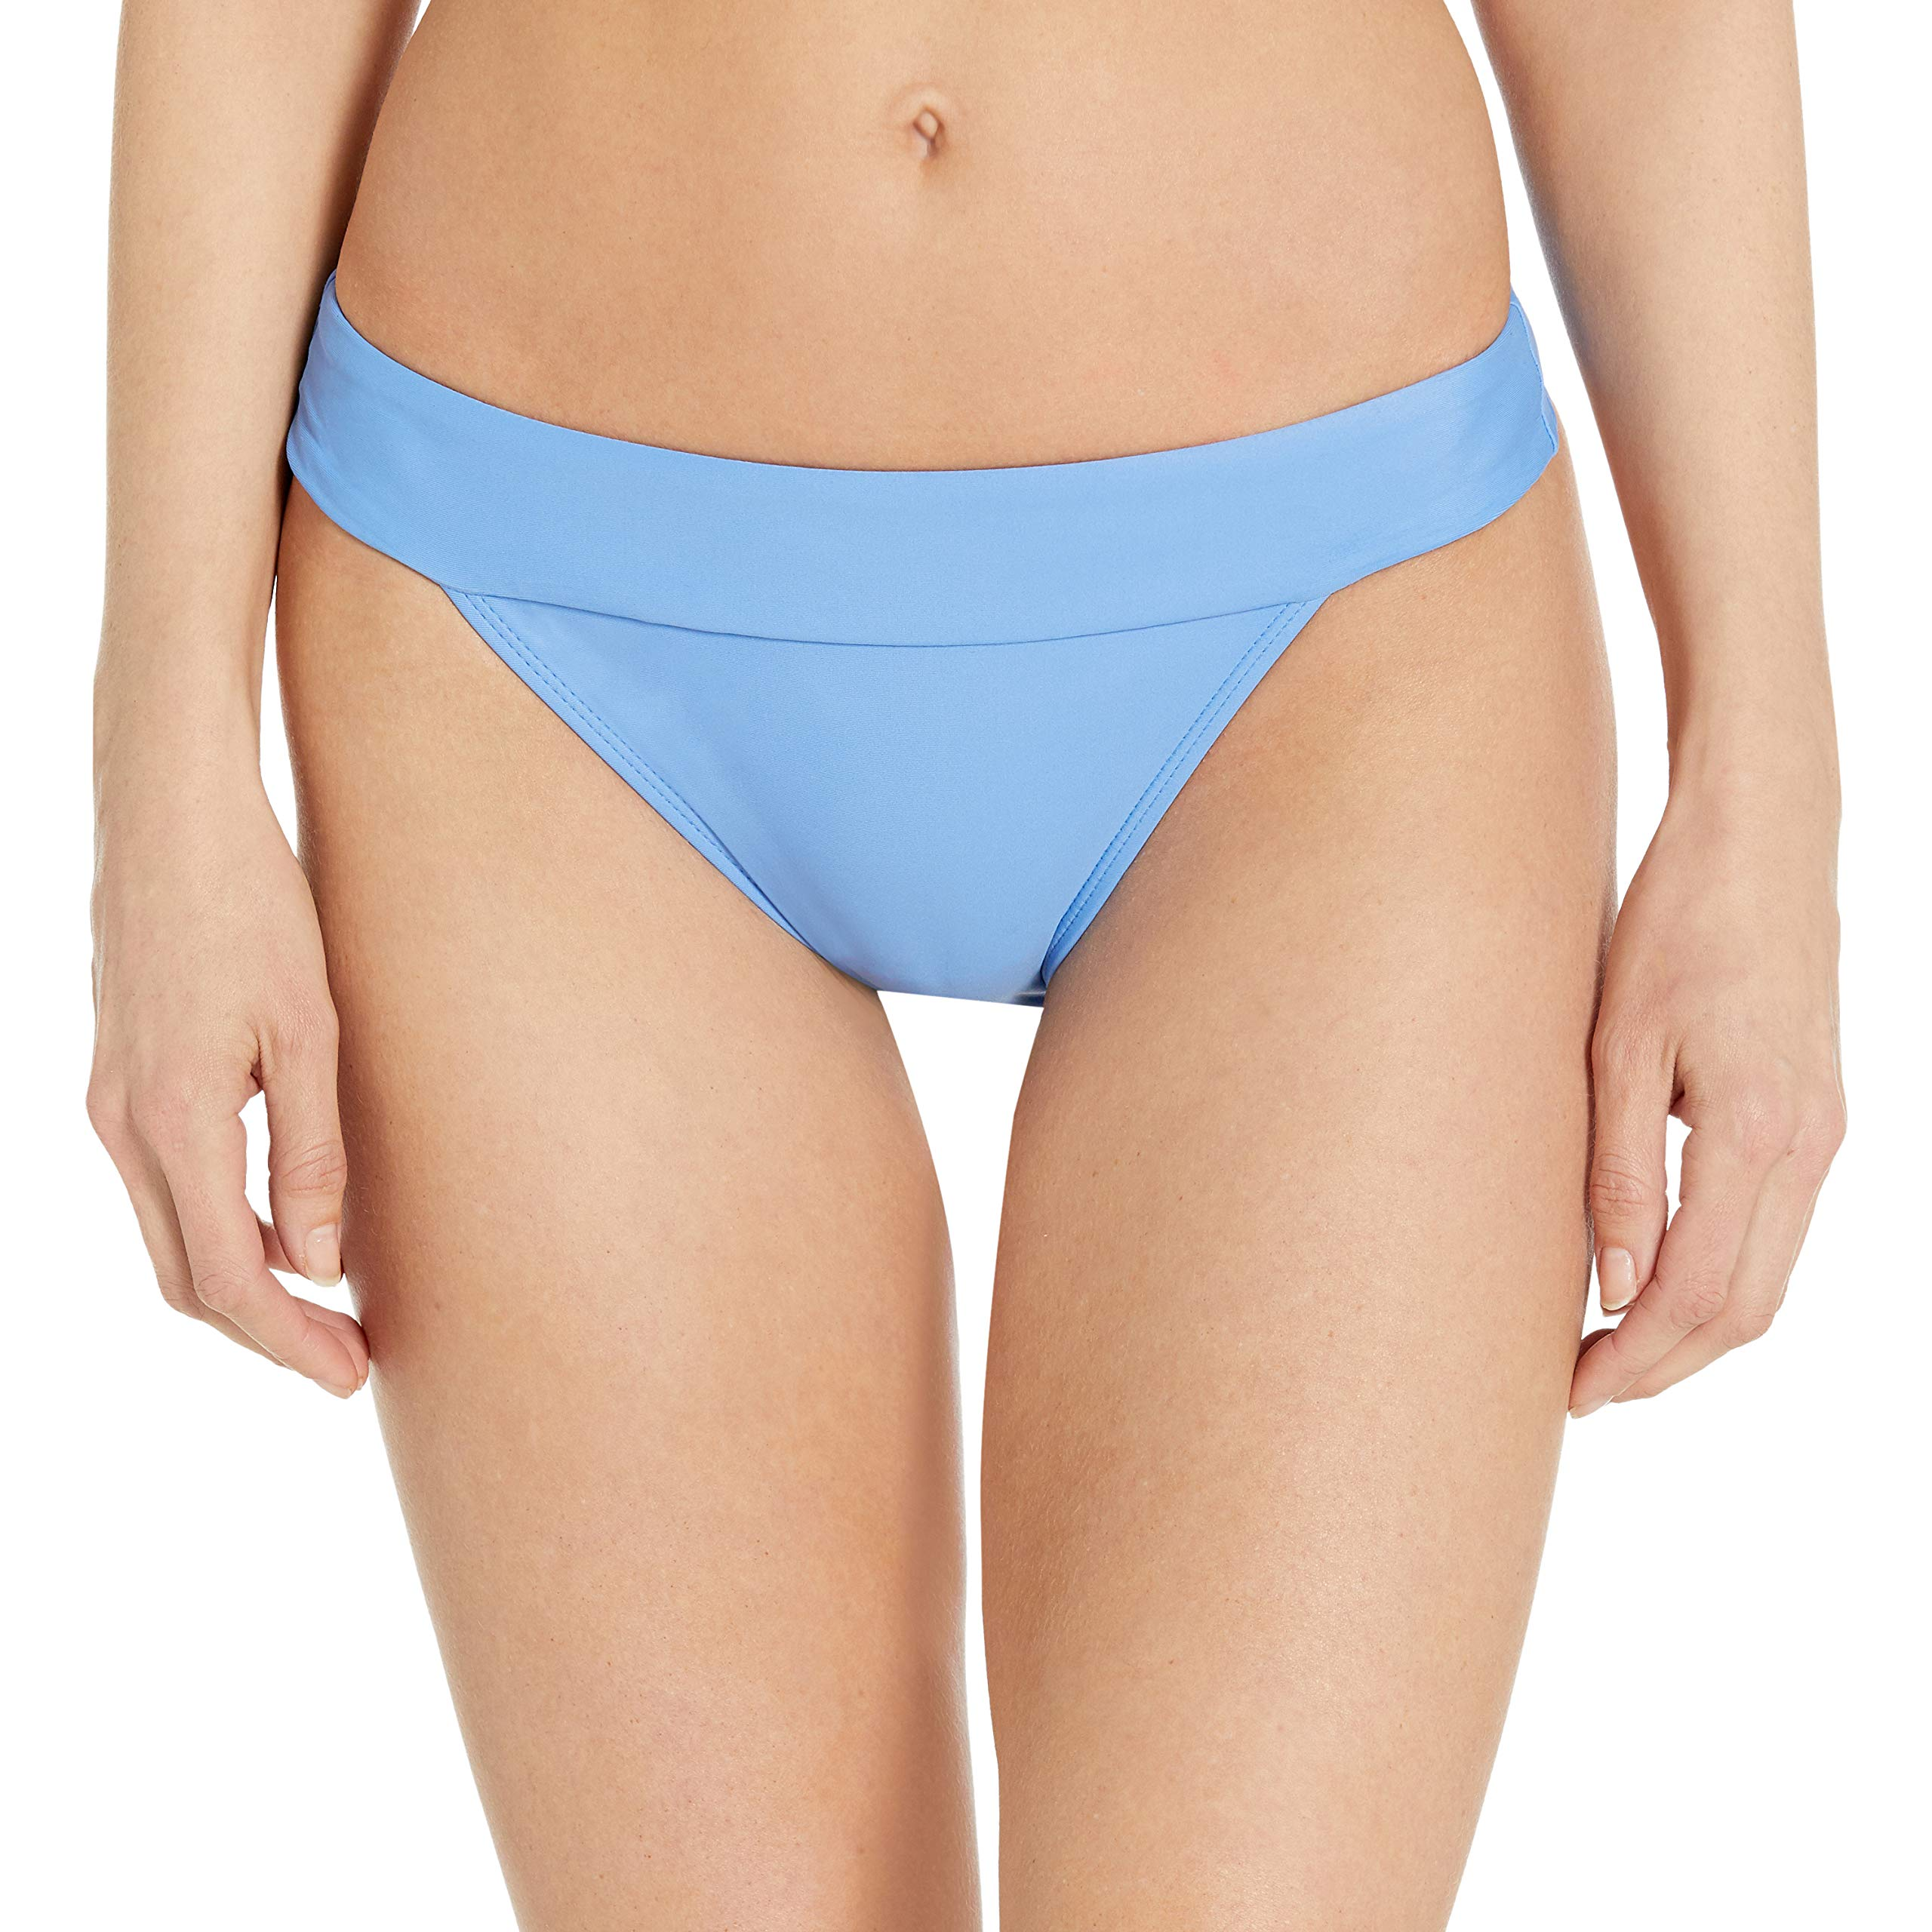 Amazon Brand - Mae Women's Swimwear Banded Cheeky Bikini Bottom